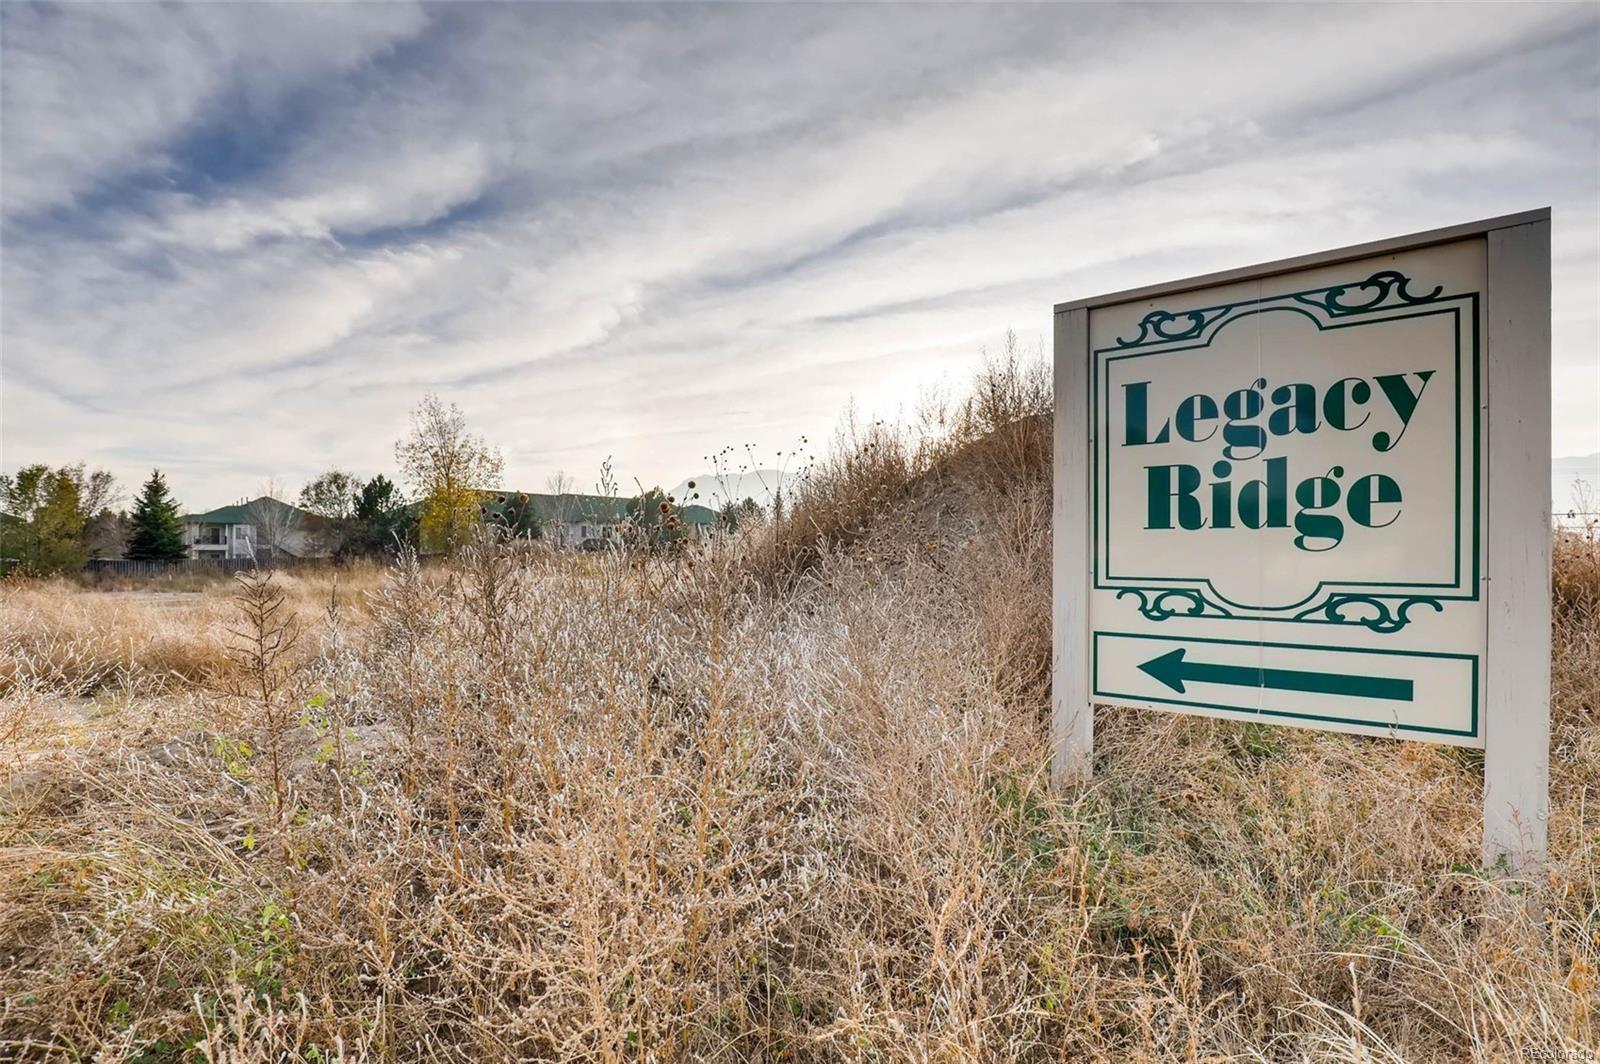 MLS# 9808696 - 6 - 2049 Legacy Ridge View, Colorado Springs, CO 80910